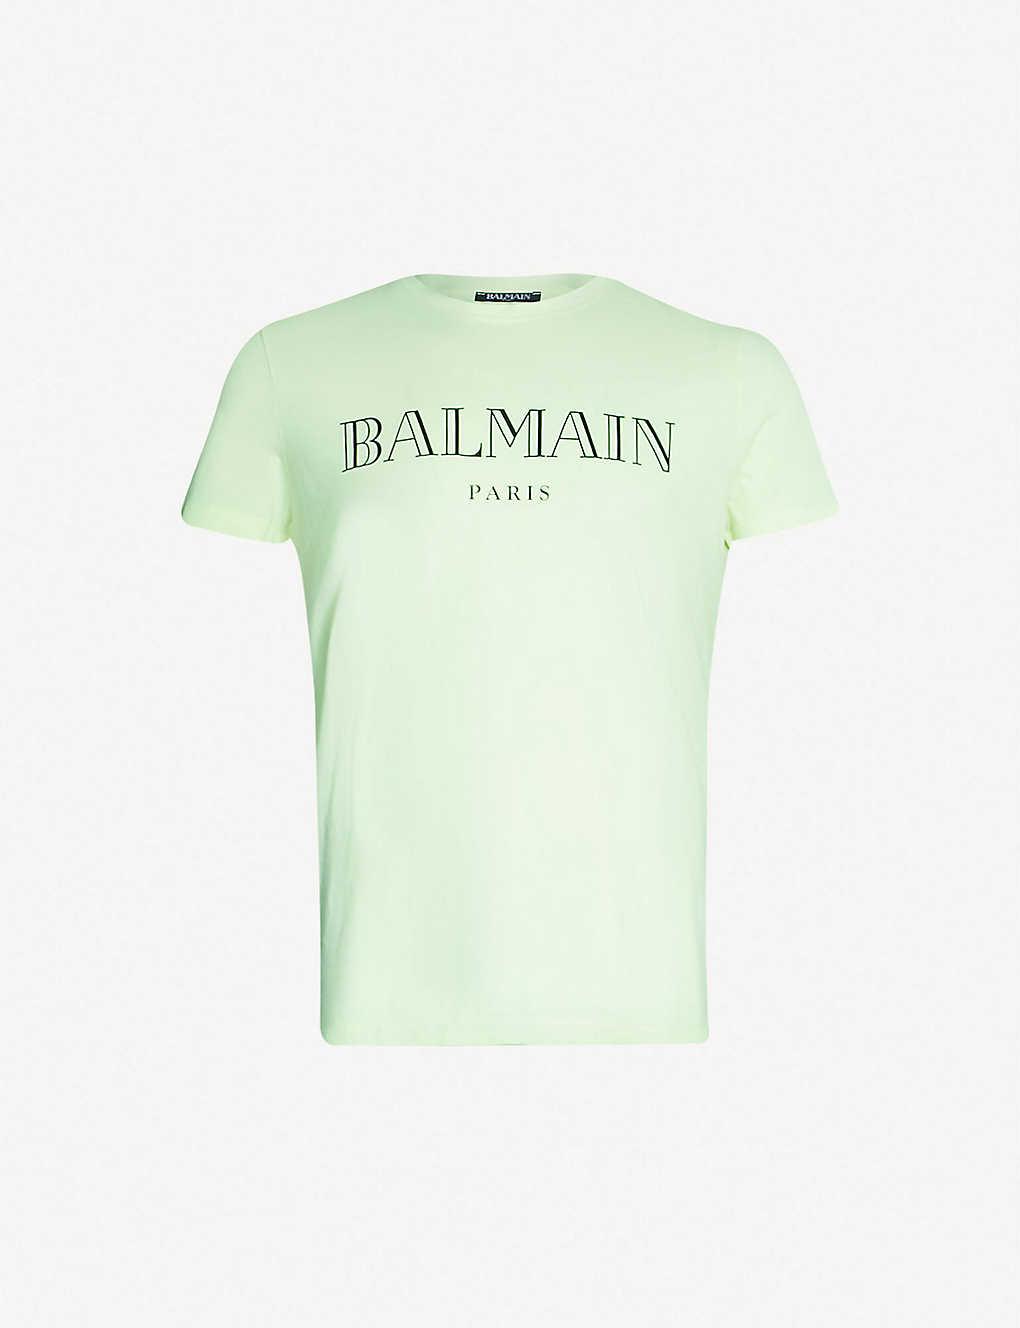 6ce86627b7655e Cotton T Shirt With Balmain Logo Print « Alzheimer's Network of Oregon